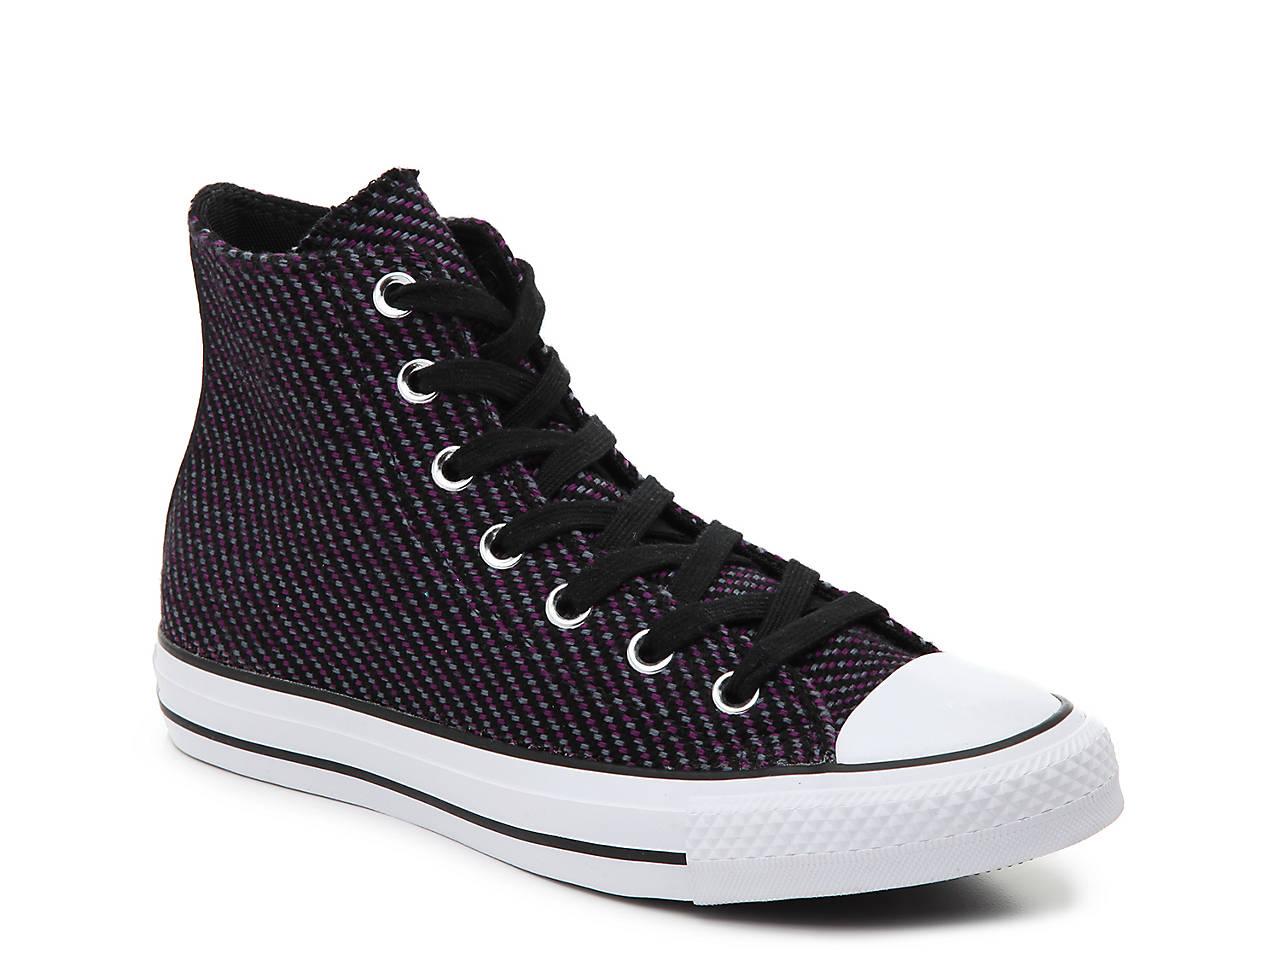 00342f1f55b9 Converse Chuck Taylor All Star Knit High-Top Sneaker - Women s ...